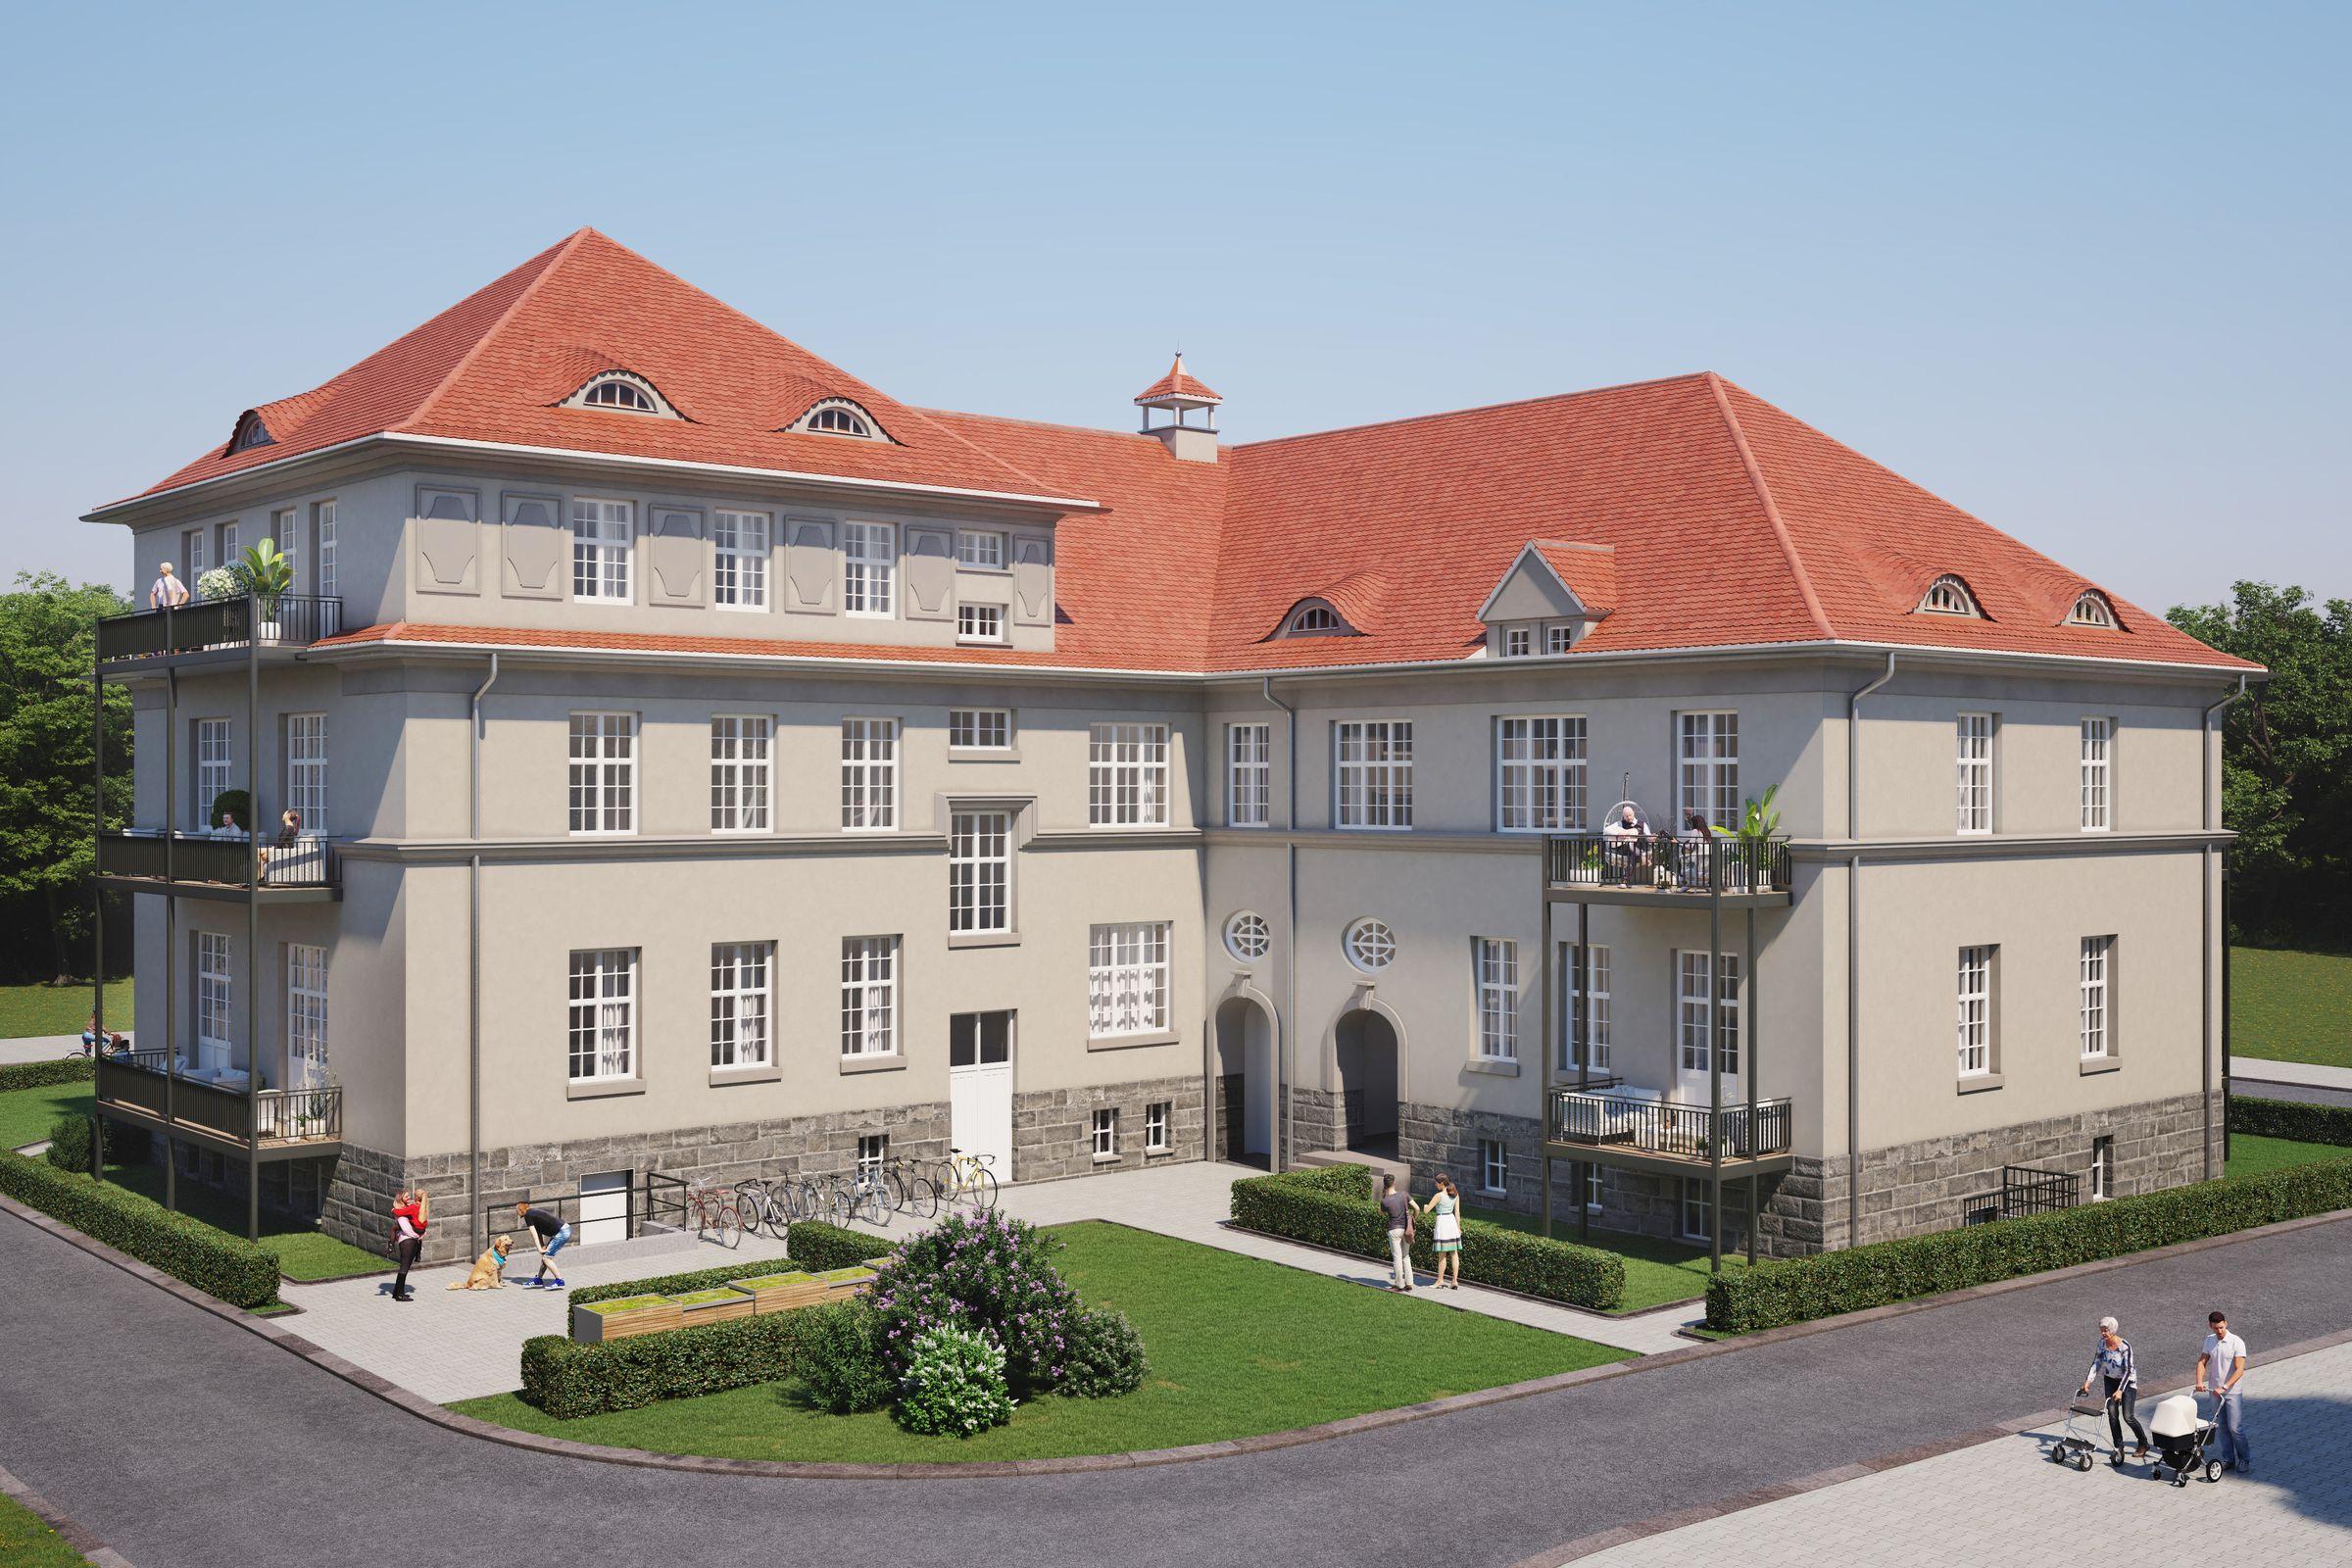 Elbtal_Immo_Garnisonsplatz_Kamenz_210301_13_CoronaCamera001b_VRayPhysicalCamera_210303_13-12_b